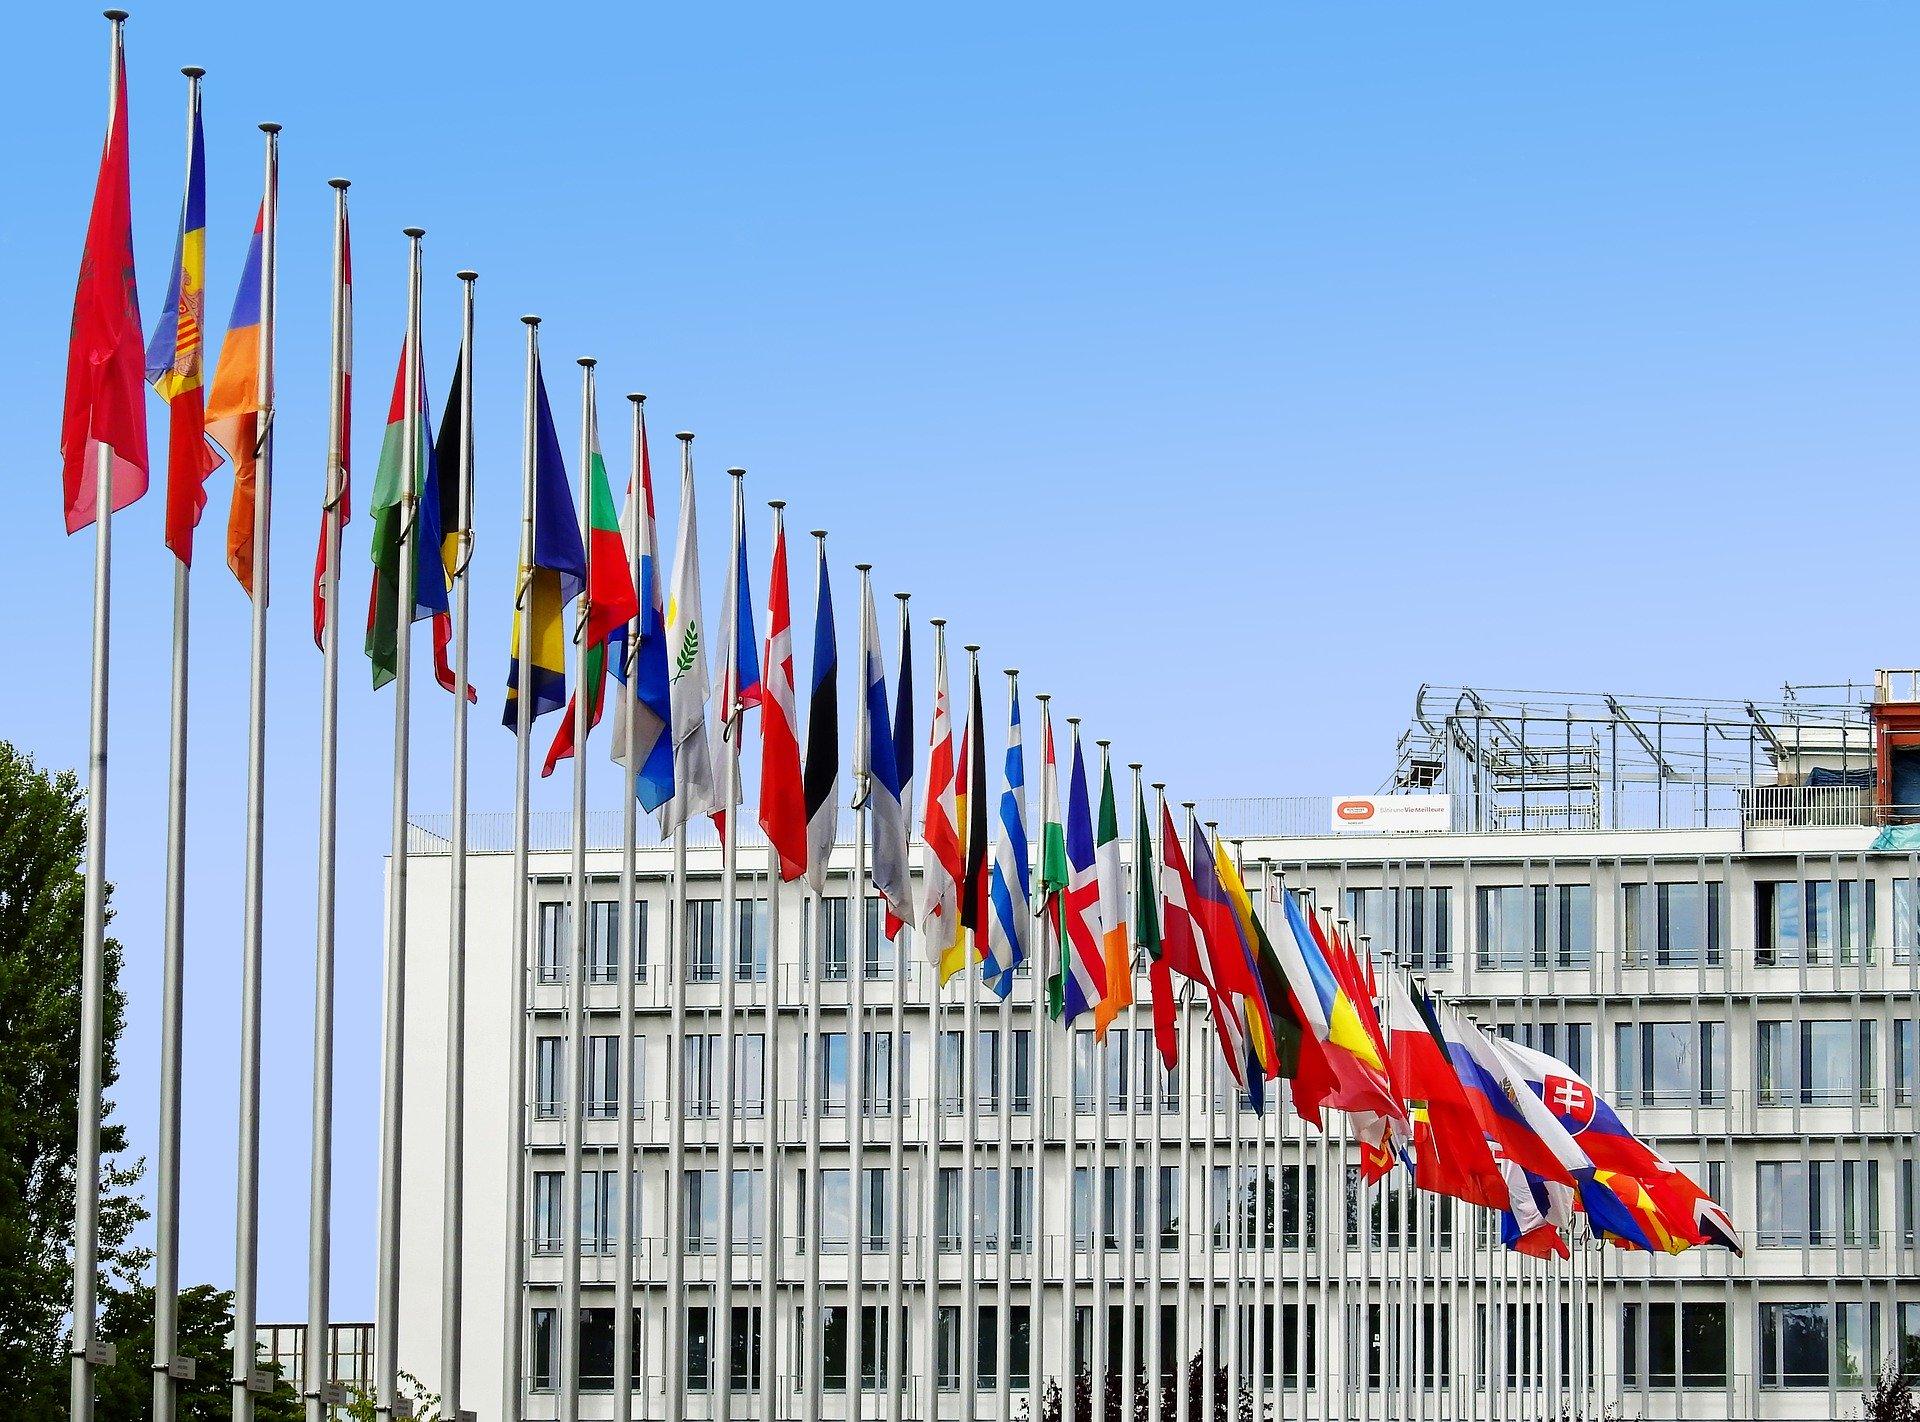 Banderas países Unión Europea